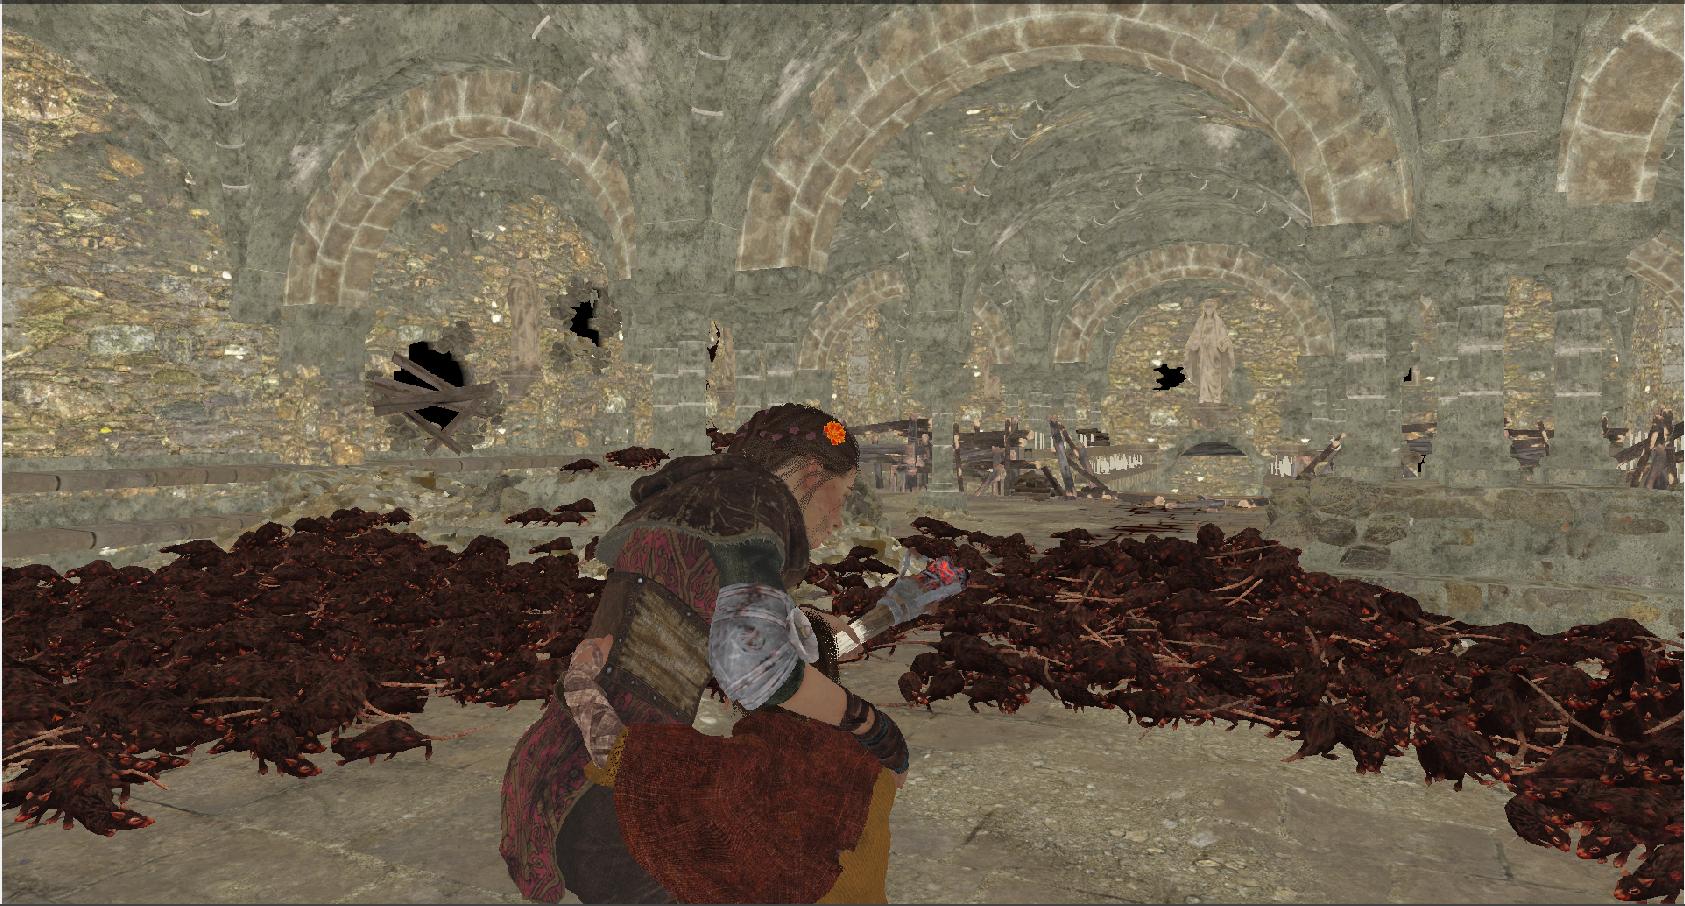 Как происходит рендеринг кадра A Plague Tale: Innocence - 21